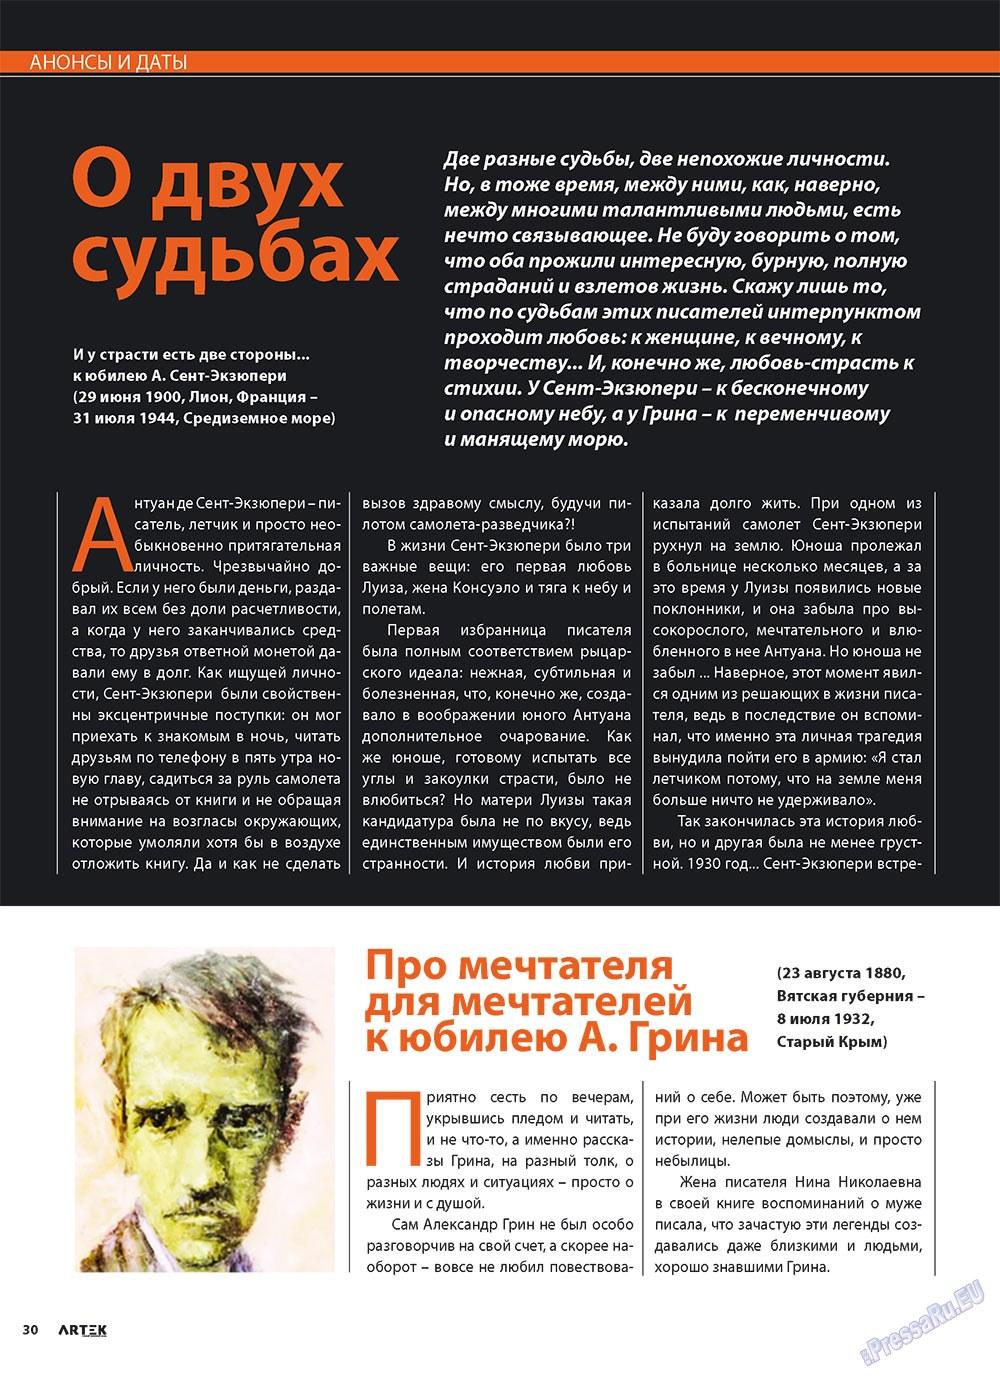 Артек (журнал). 2010 год, номер 3, стр. 32